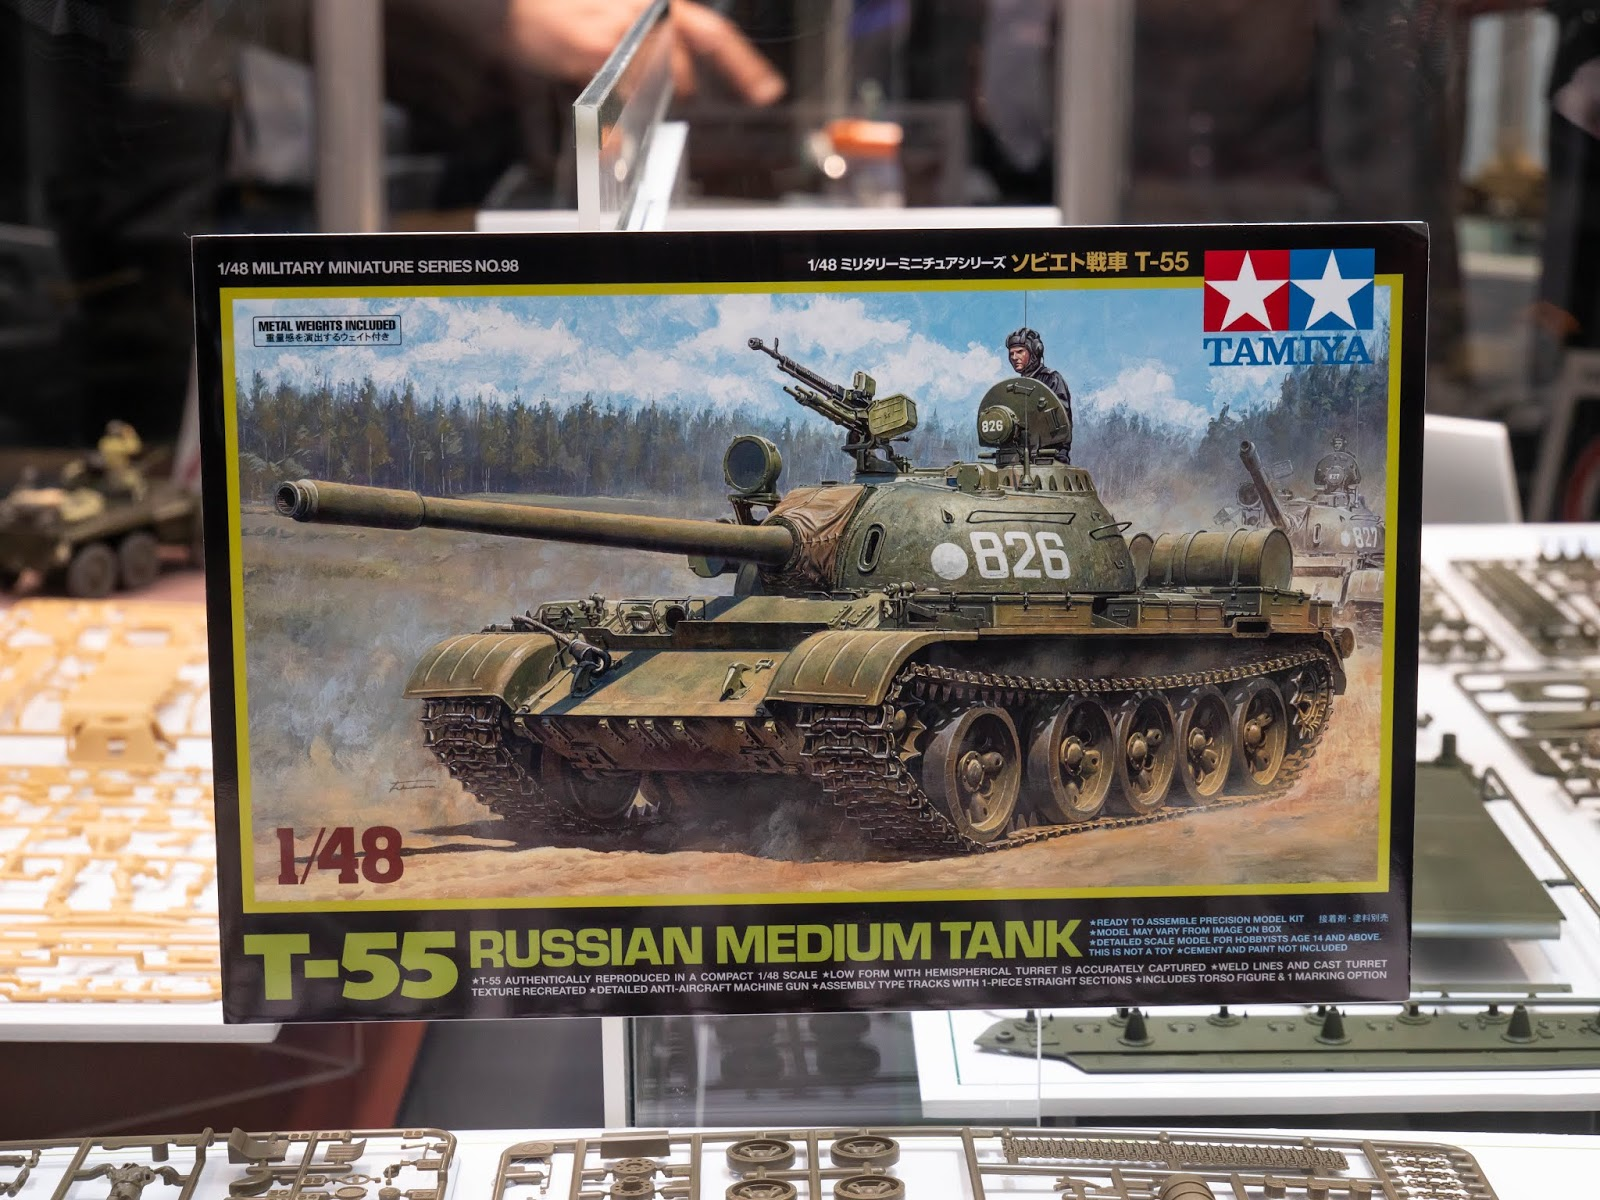 Tamiya 32598 1//48 Scale Military Model Kit Soviet Russian Medium Tank T-55